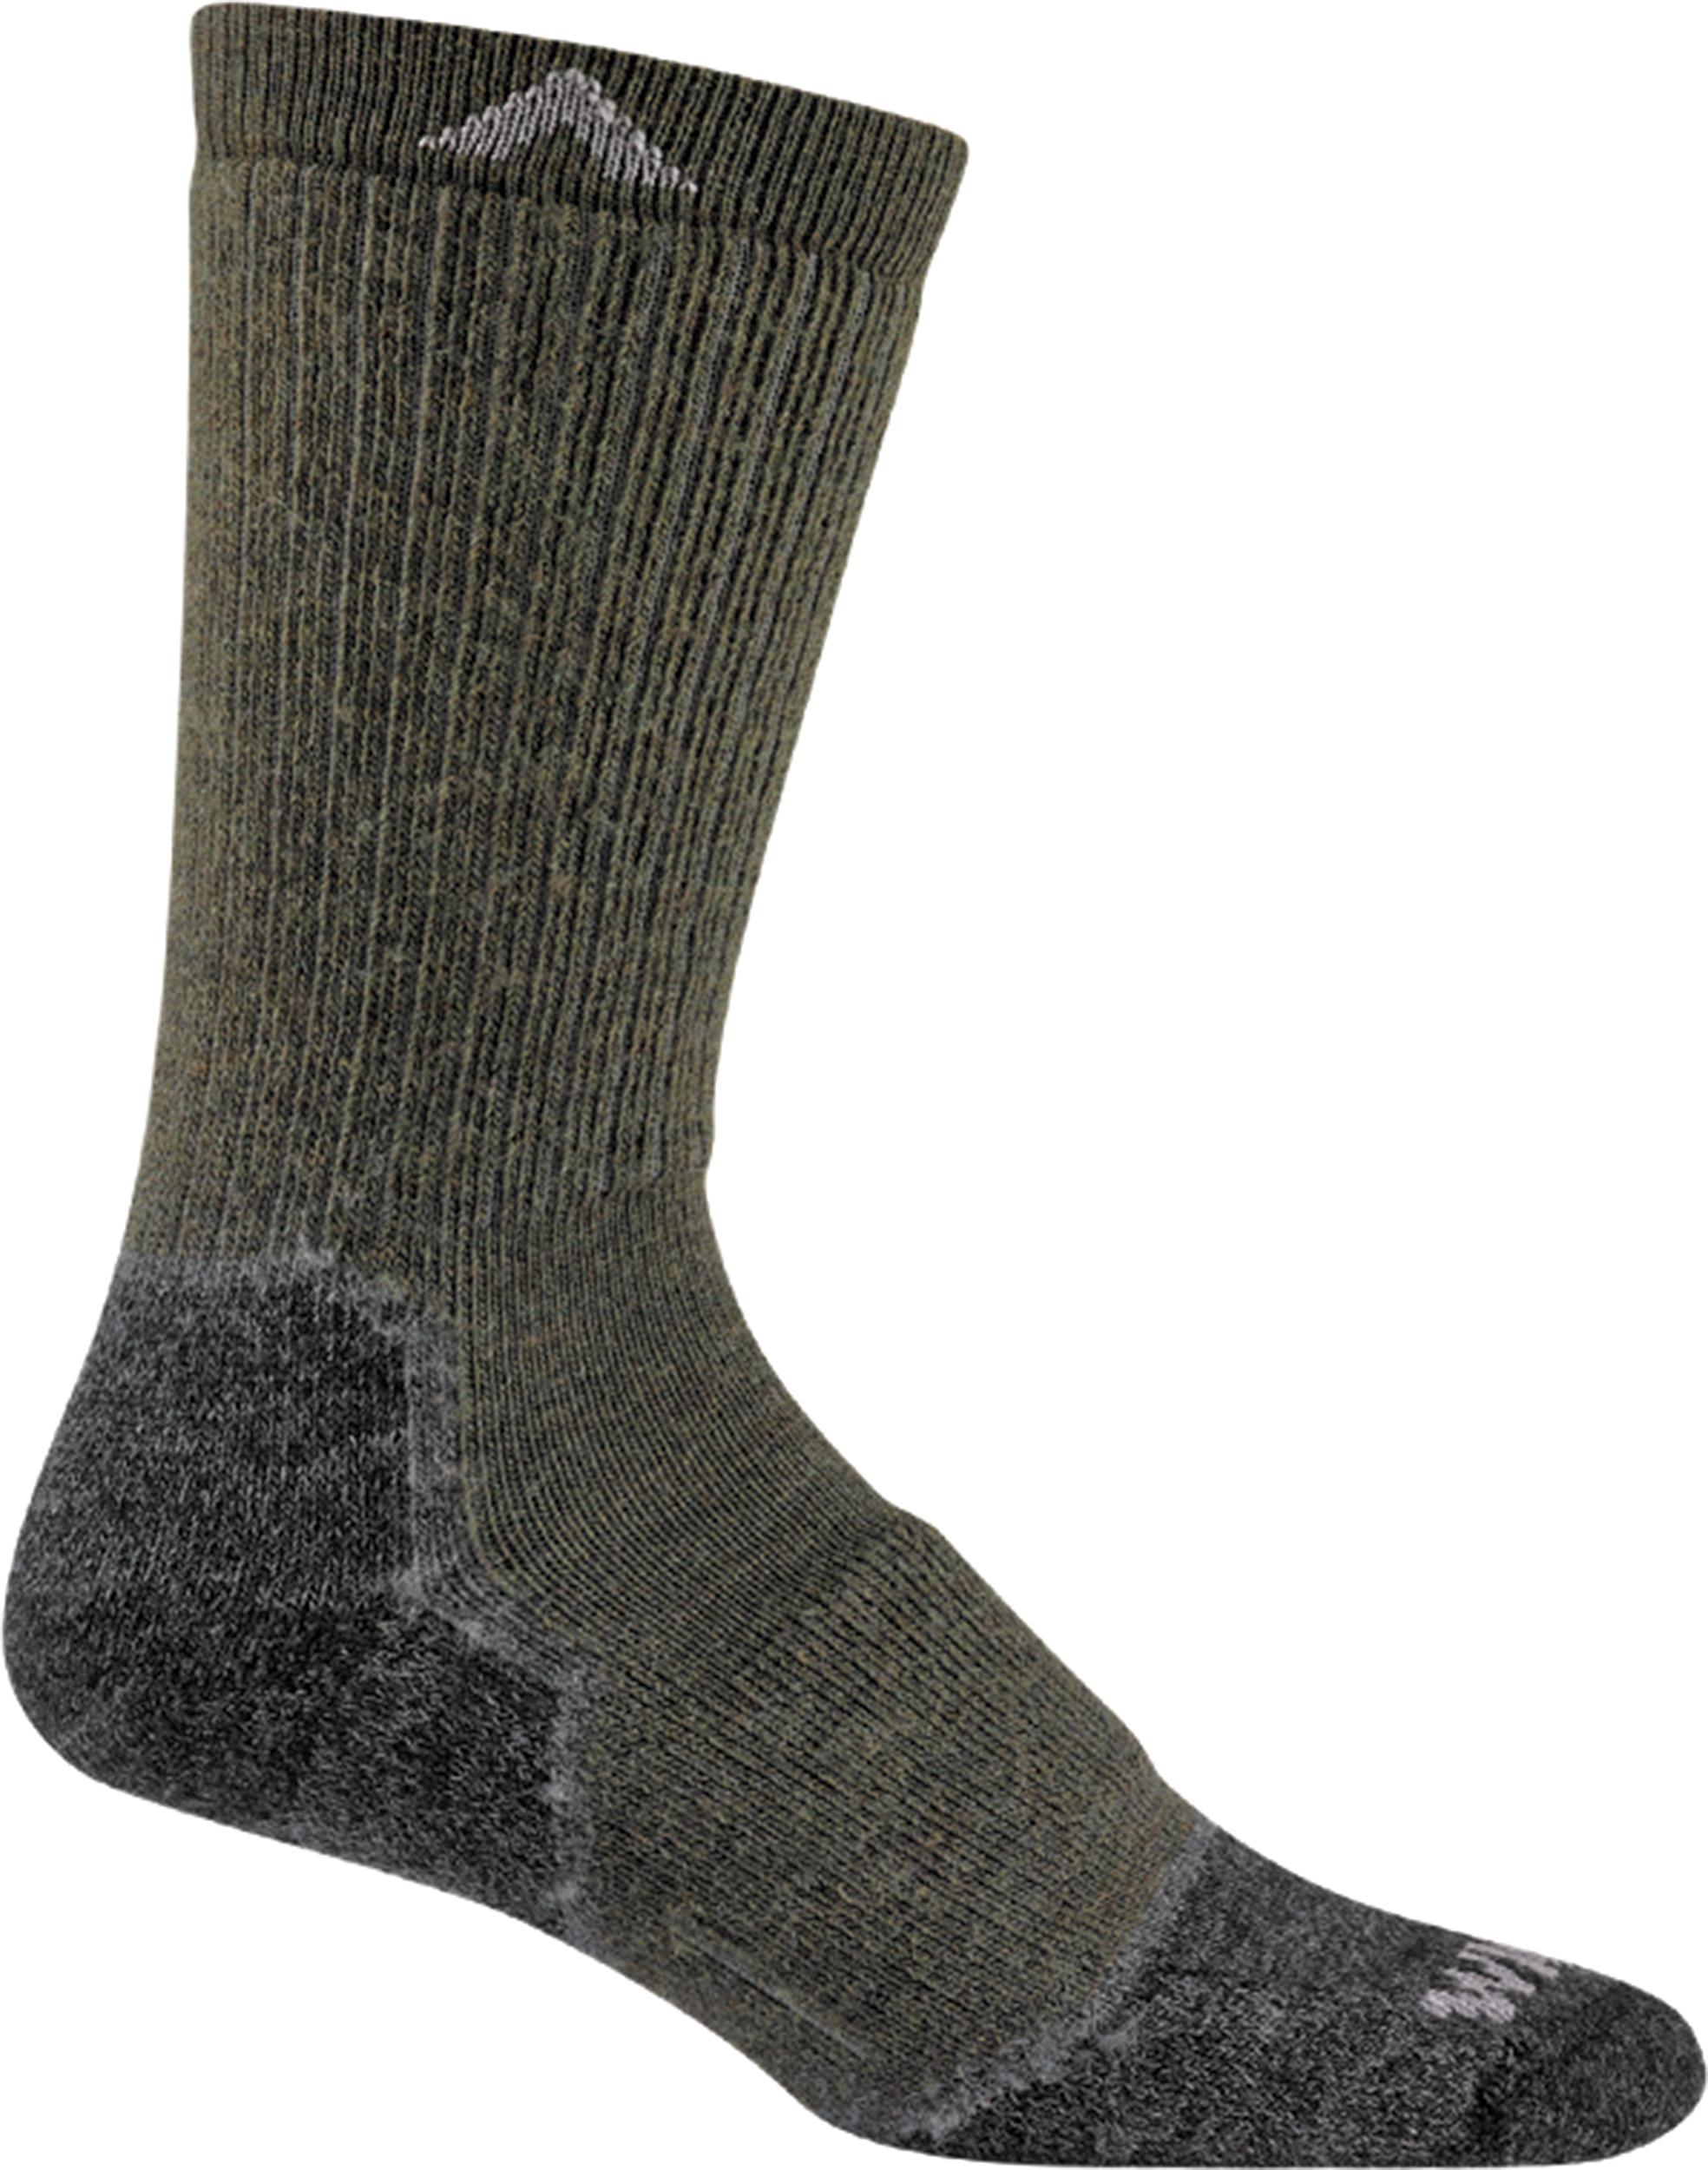 6d8bc90a47f5c Wigwam Merino Light Hiker Socks - Unisex | MEC